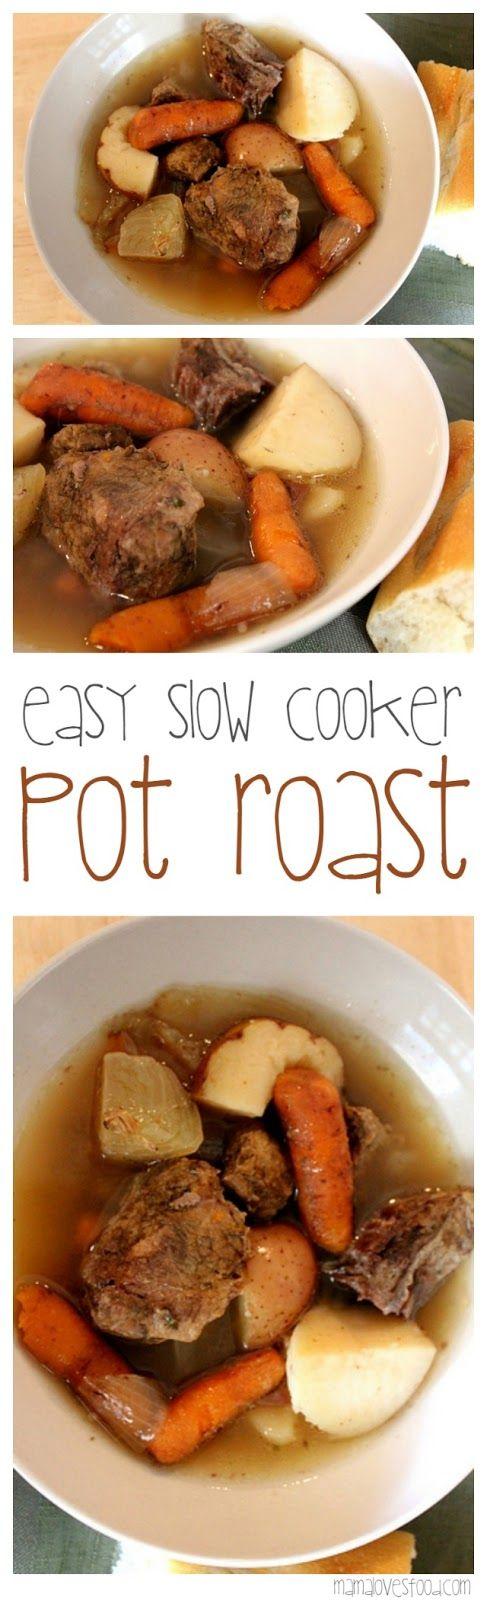 Simple Crock-Pot Beef Pot Roast and Gravy Recipe | MamaLovesFood.com ...